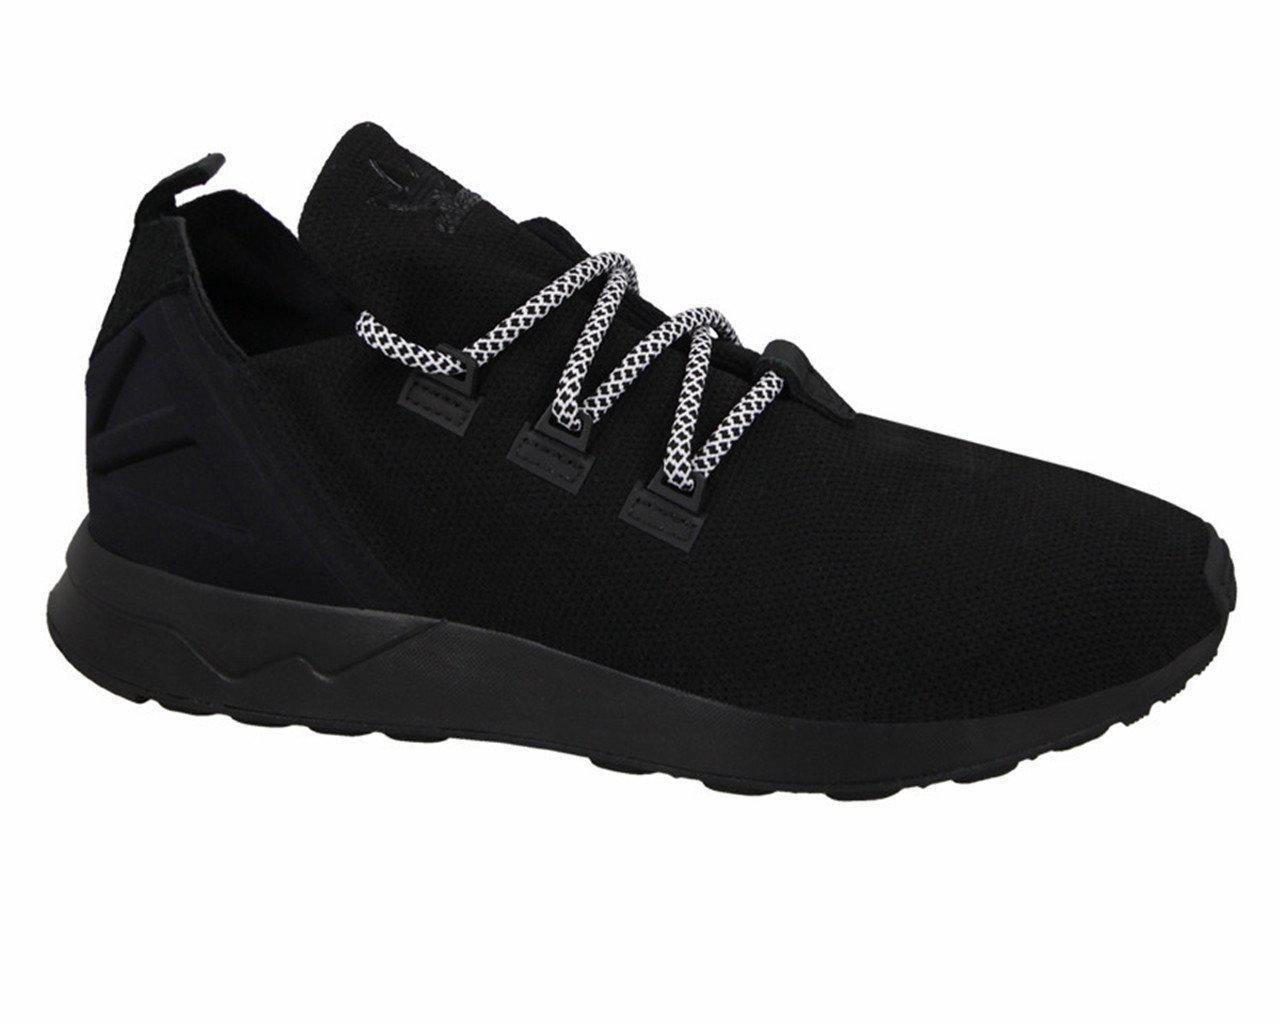 adidas Rubber Originals Zx Flux Adv X Black Trainers for Men